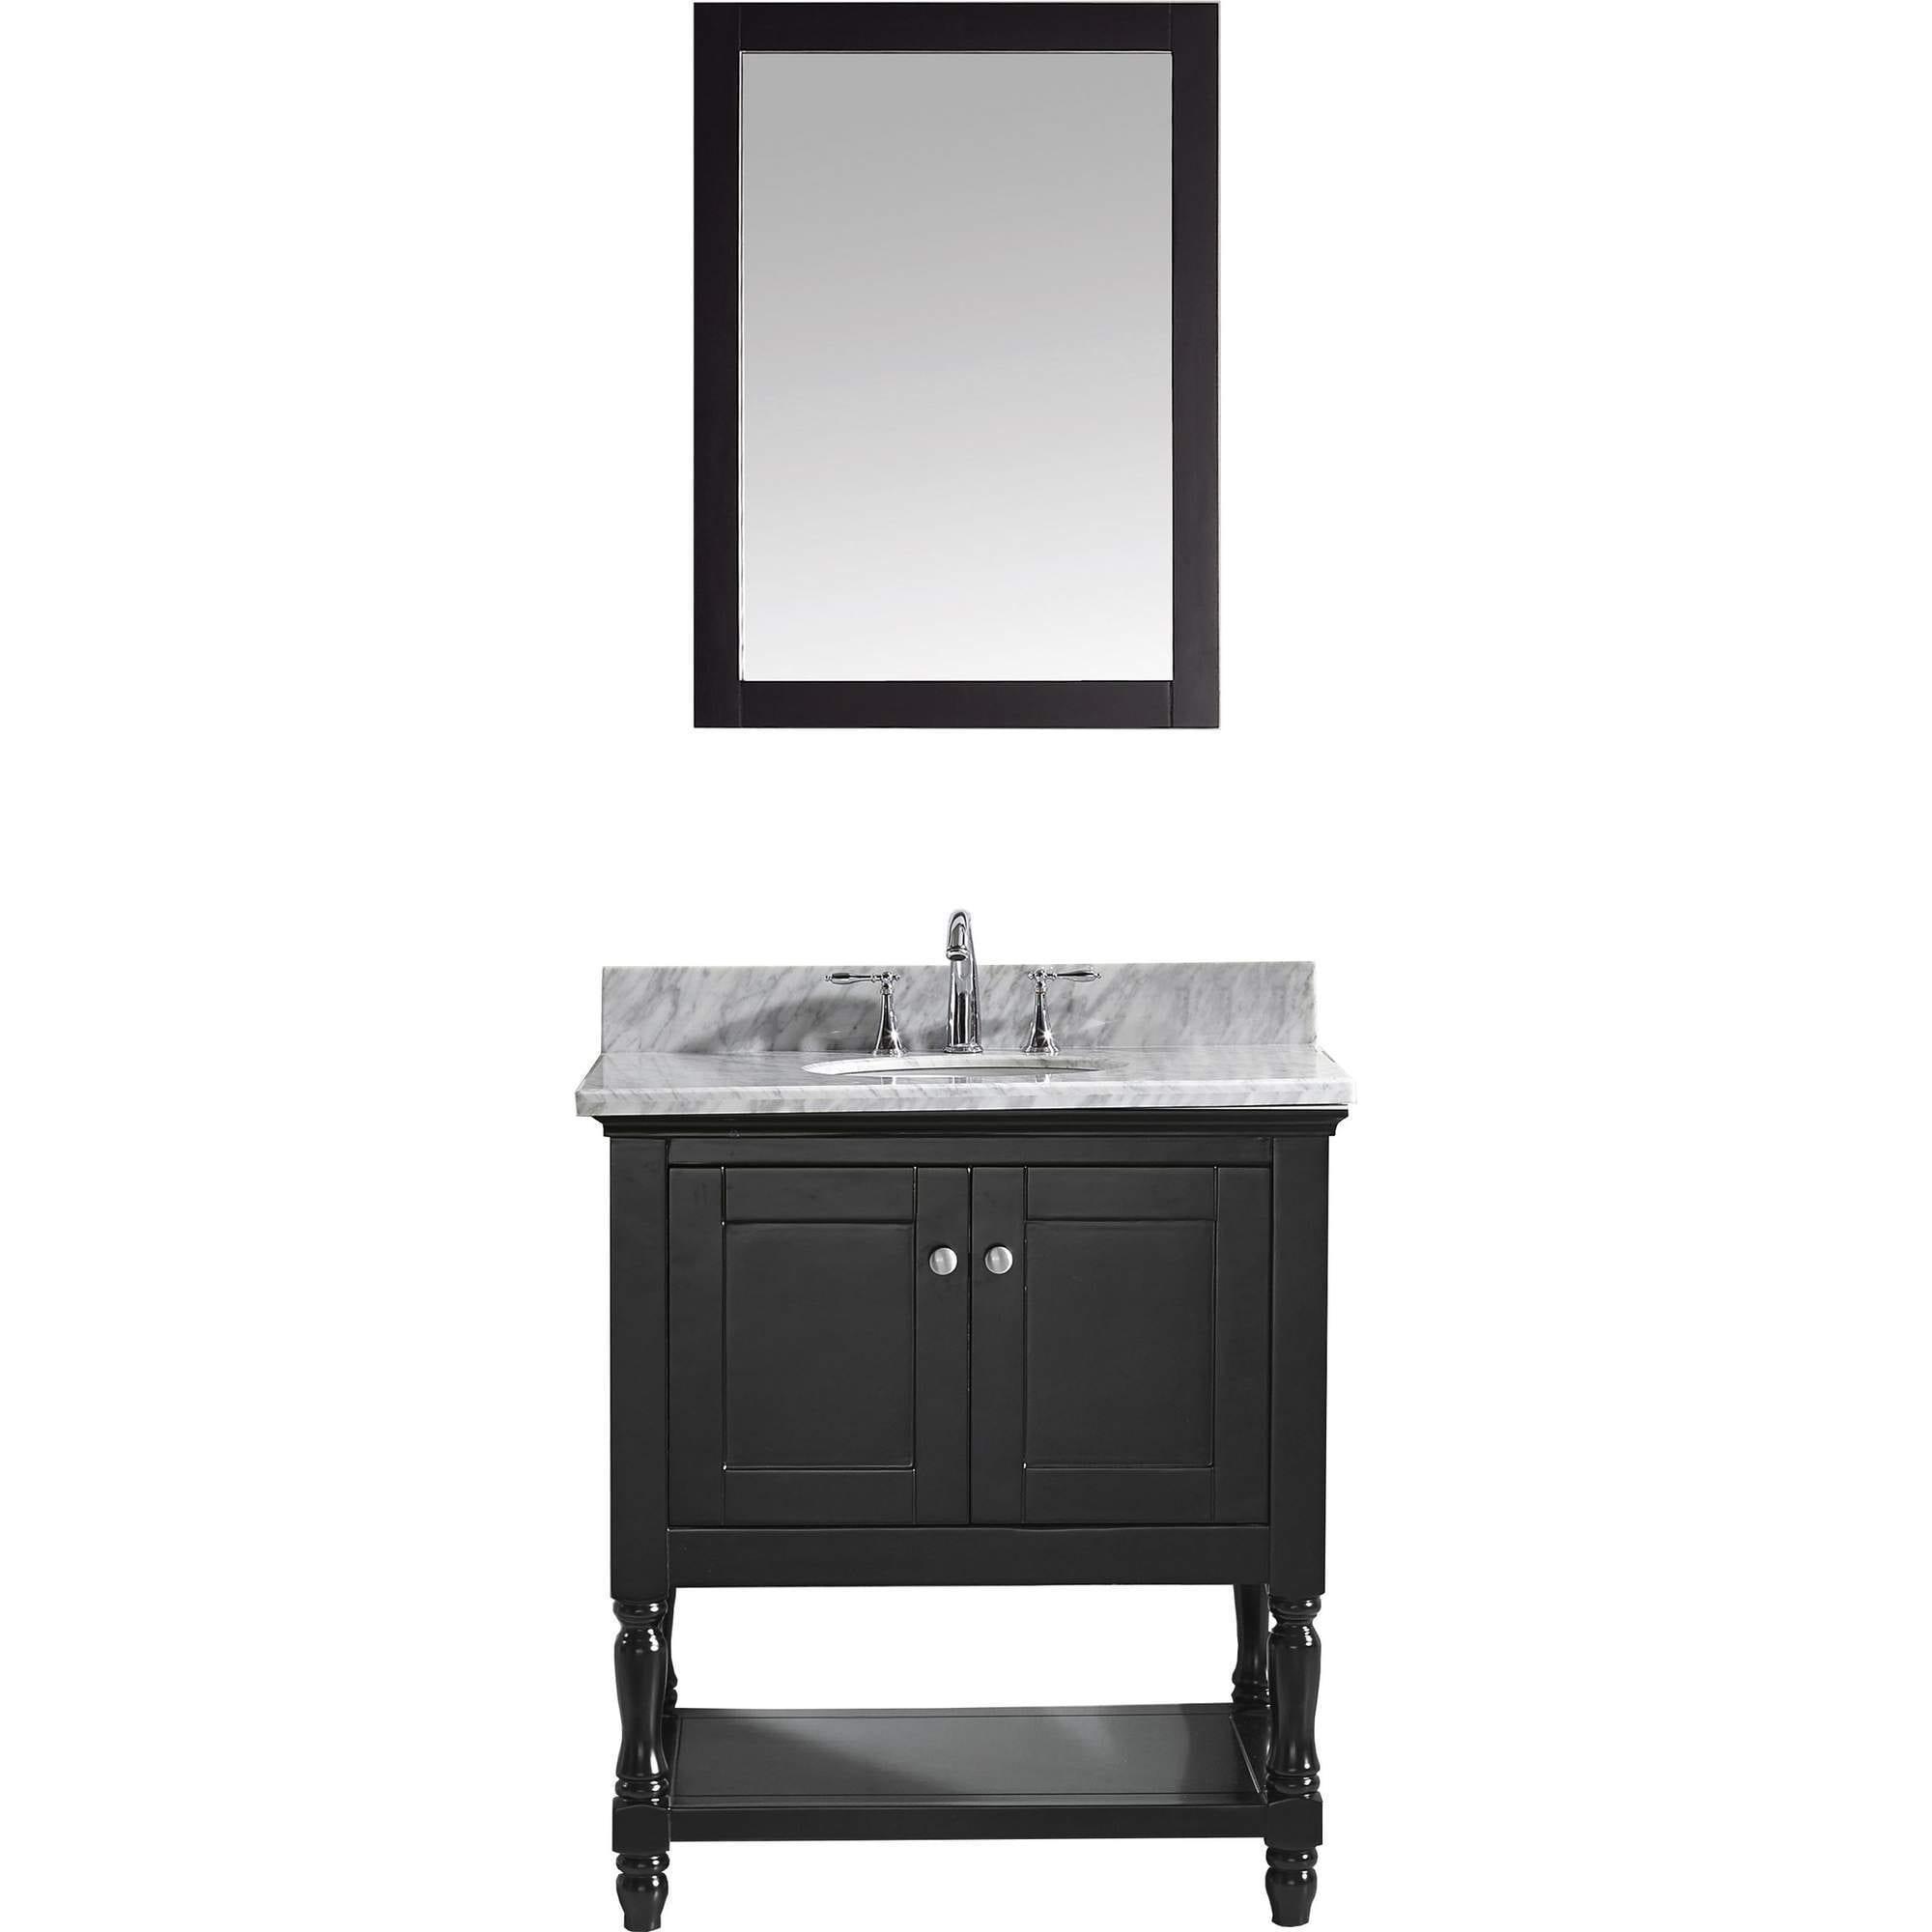 Virtu usa julianna 32 inch white marble single bathroom vanity set espresso